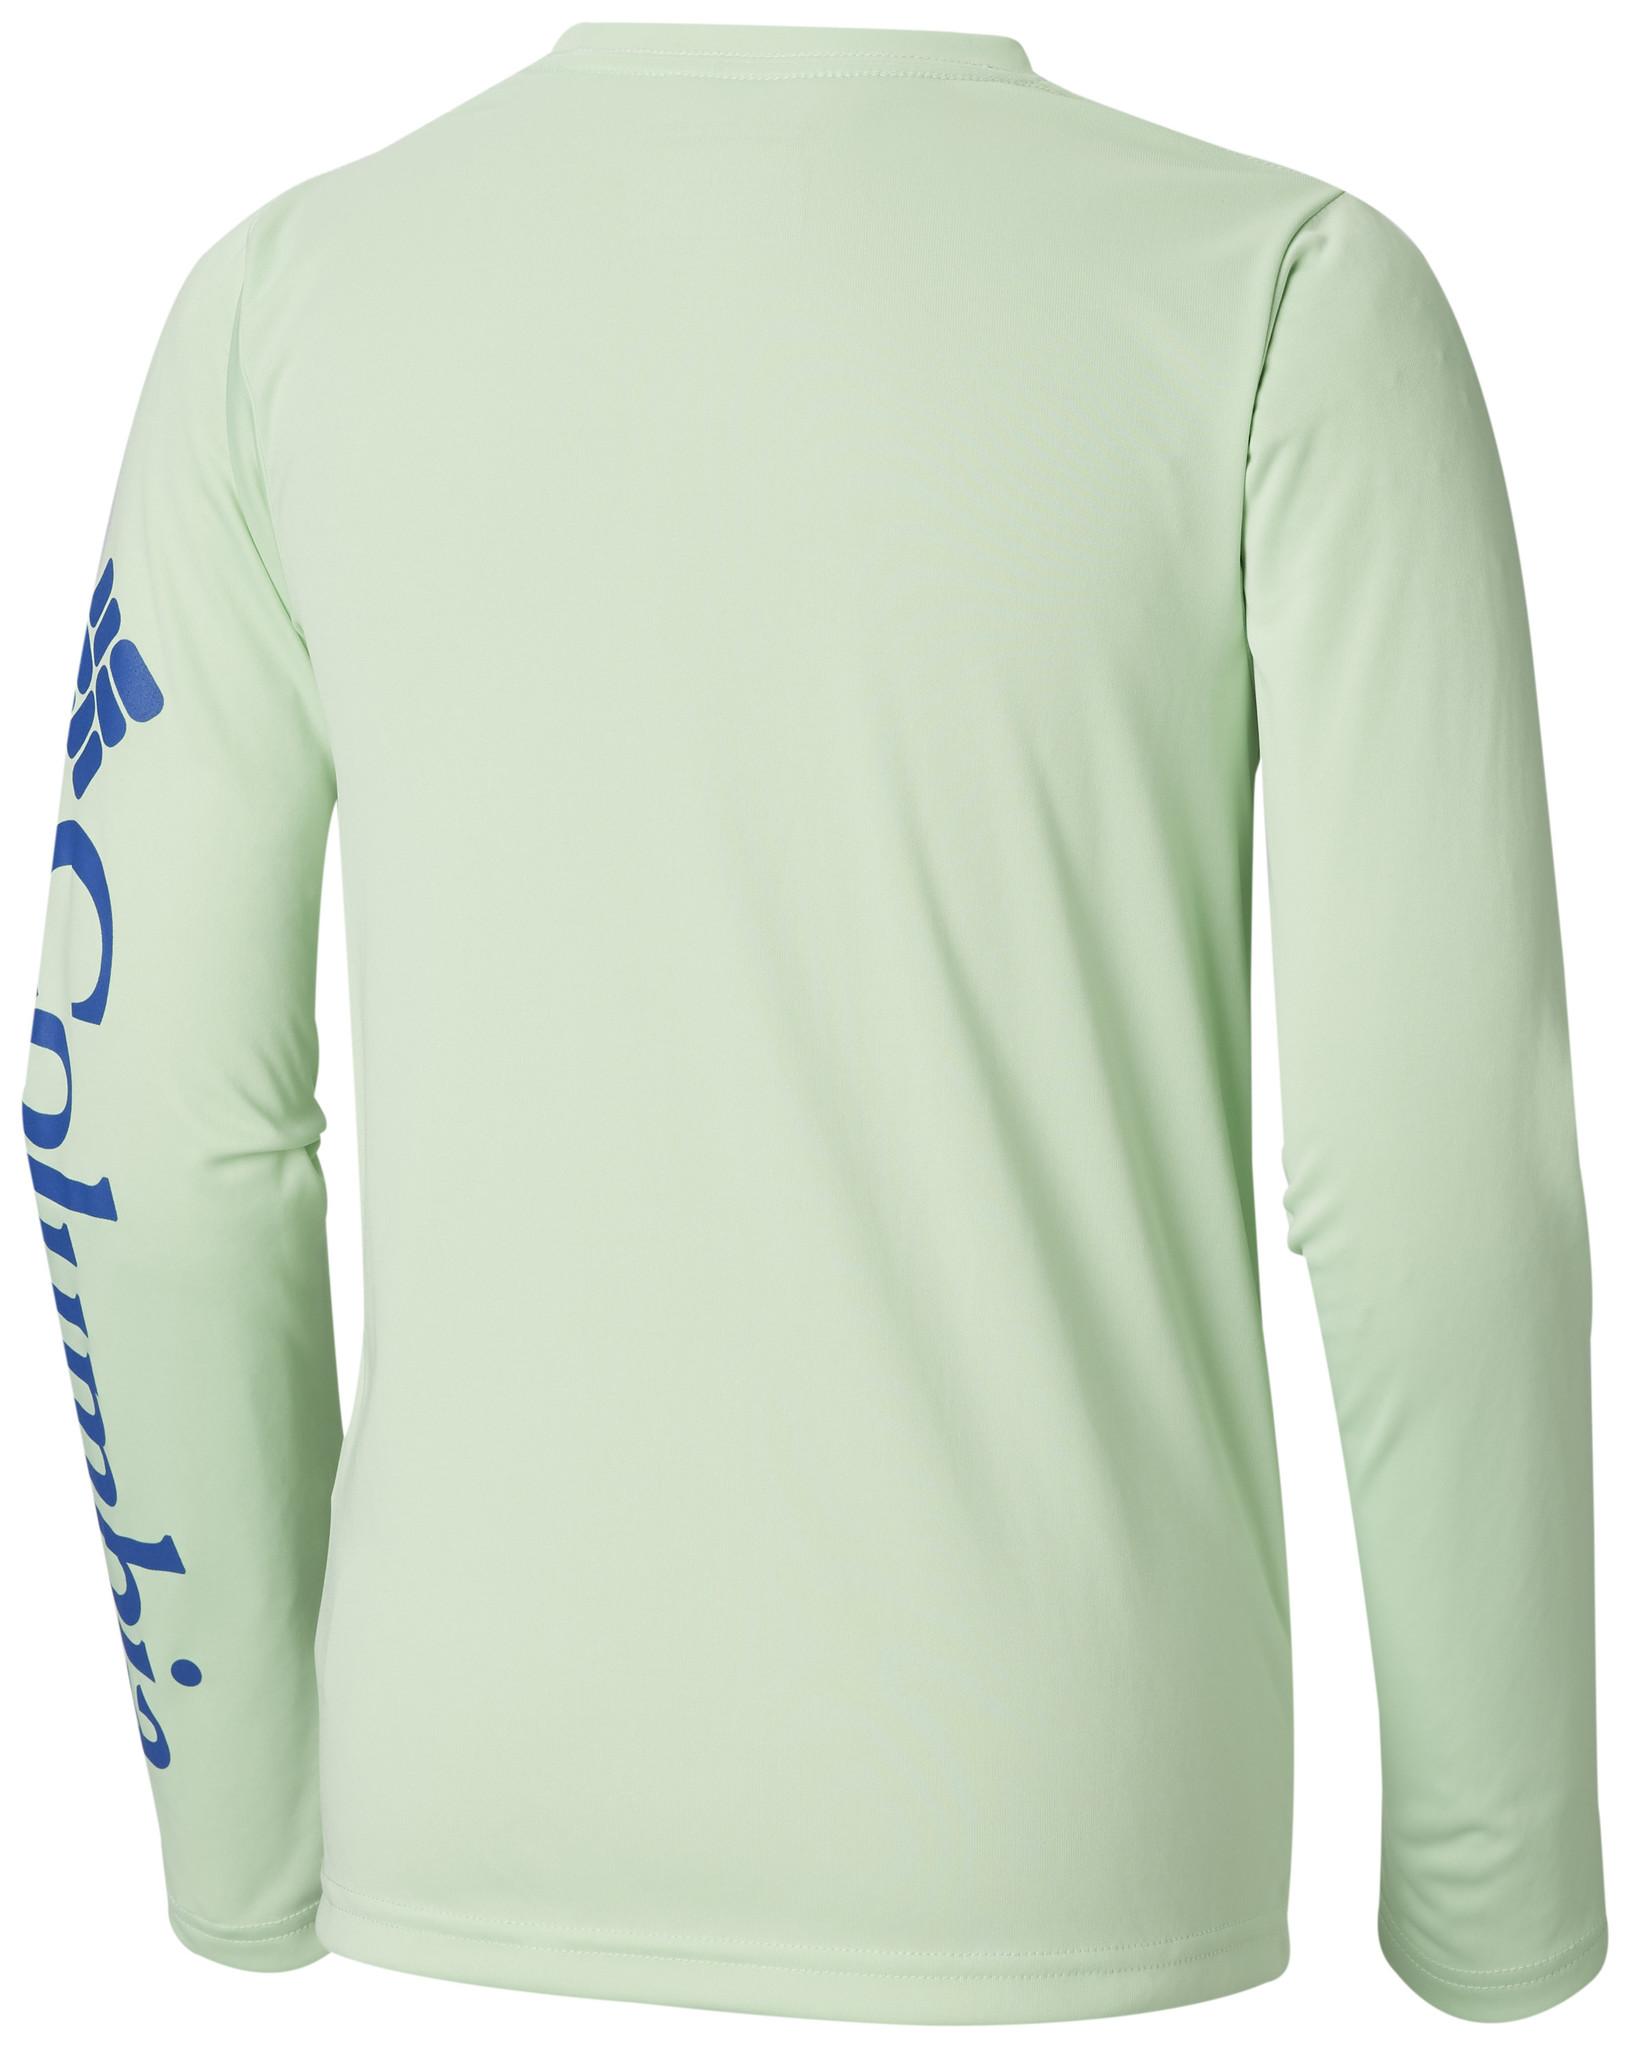 db53b0eae0e Kids' PFG Terminal Tackle™ Long Sleeve Tee - King Frog Clothing ...